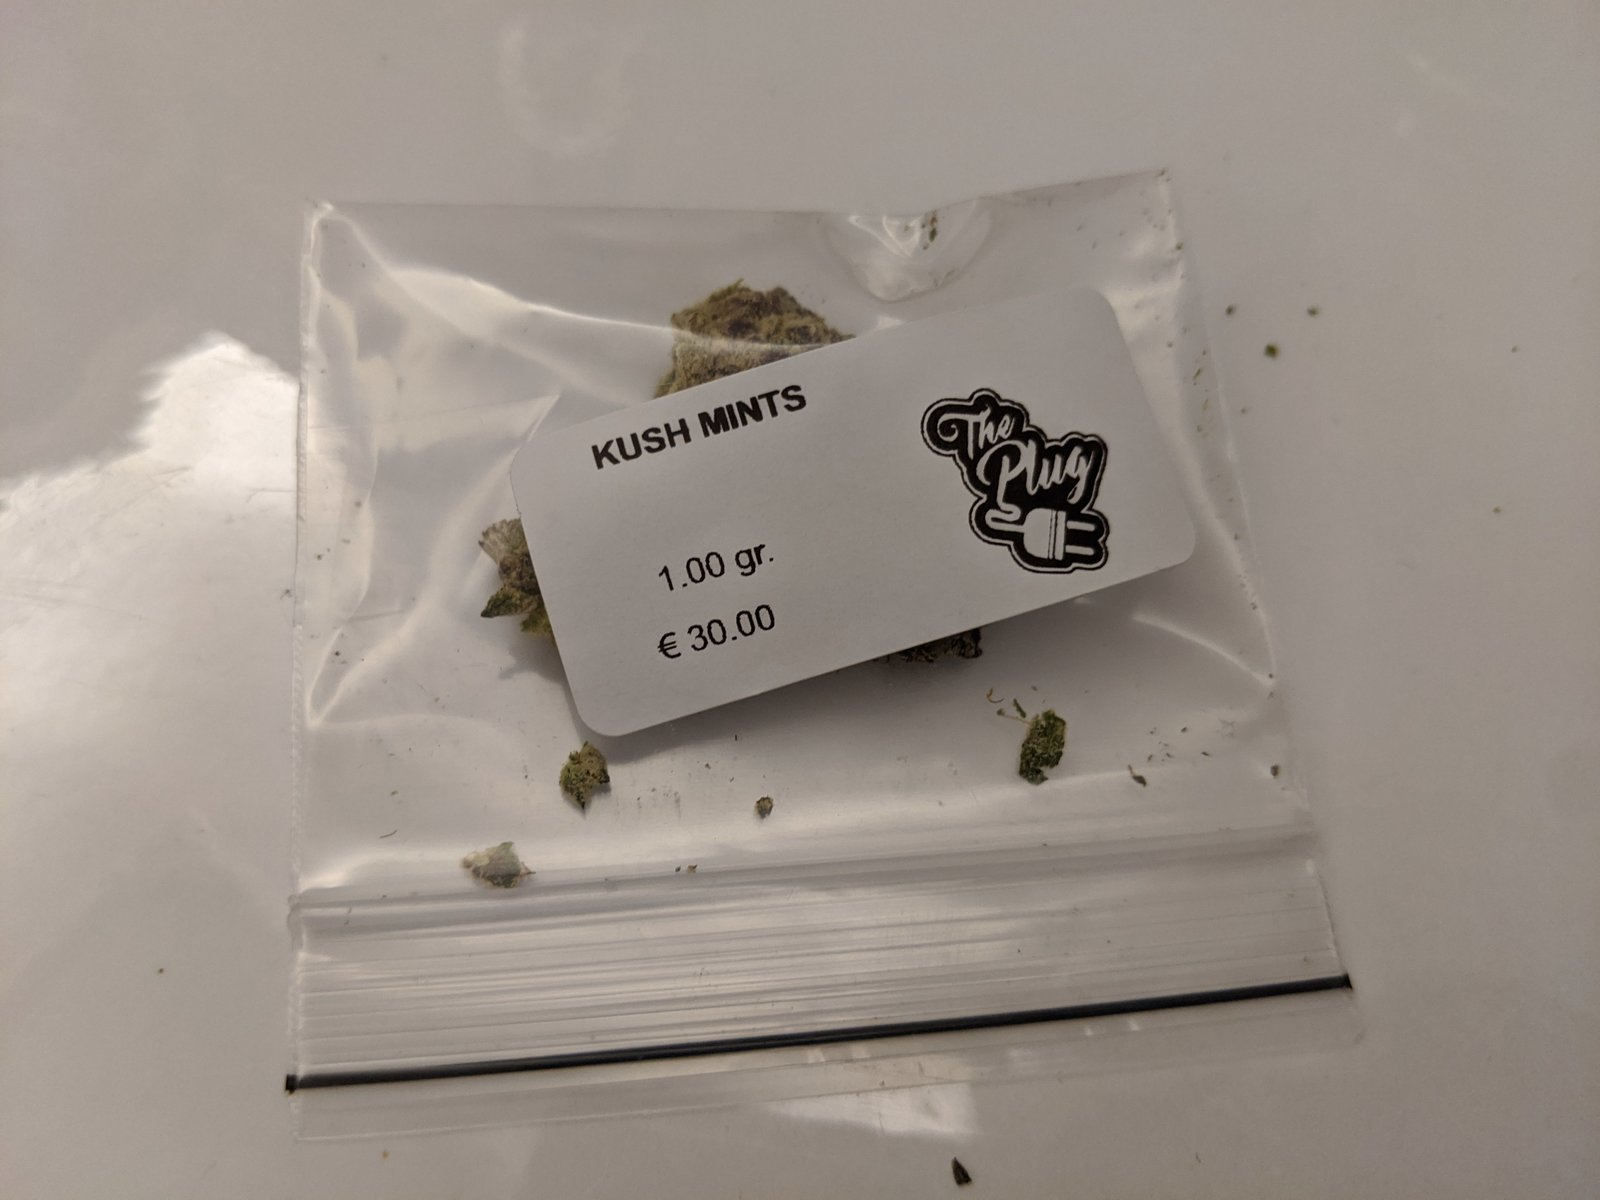 Kush Mintz - The Plug - Amsterdam 08.2020